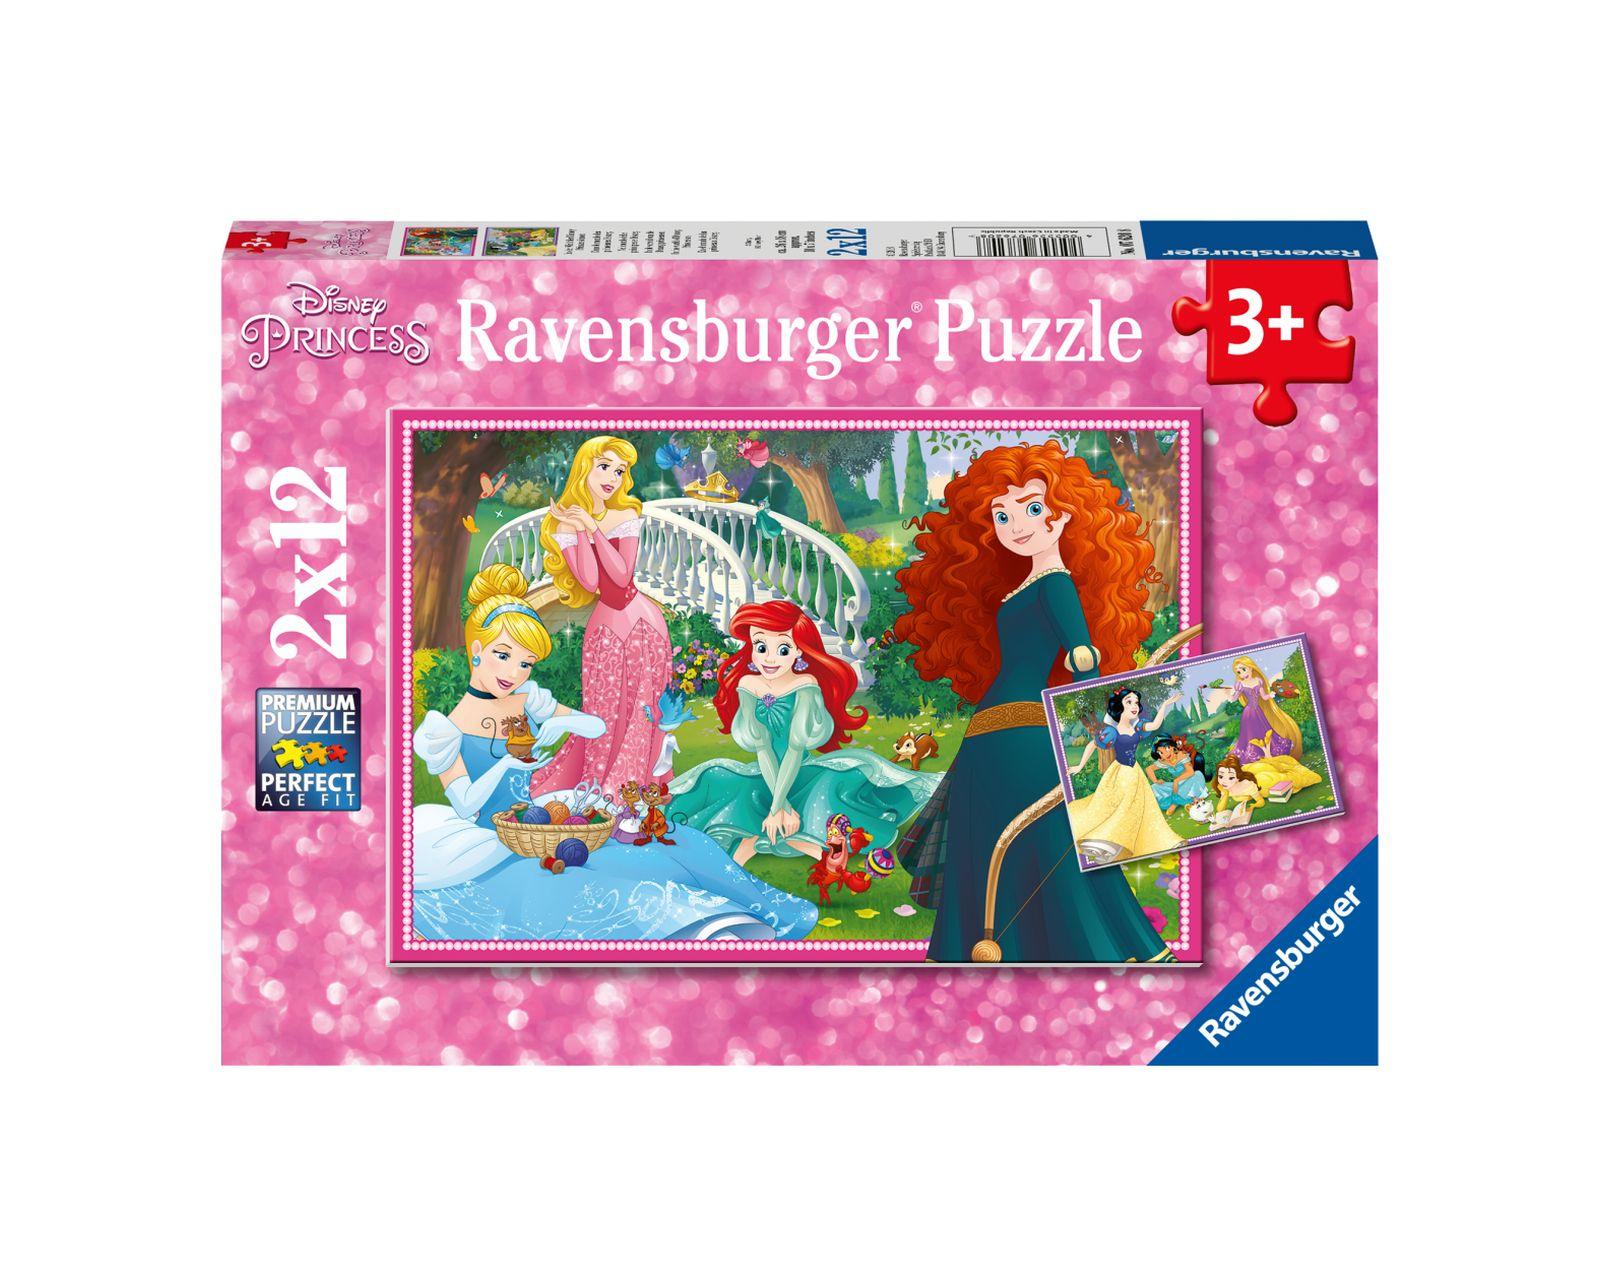 Ravensburger - puzzle 2x12 pezzi - disney princess - Ravensburger1